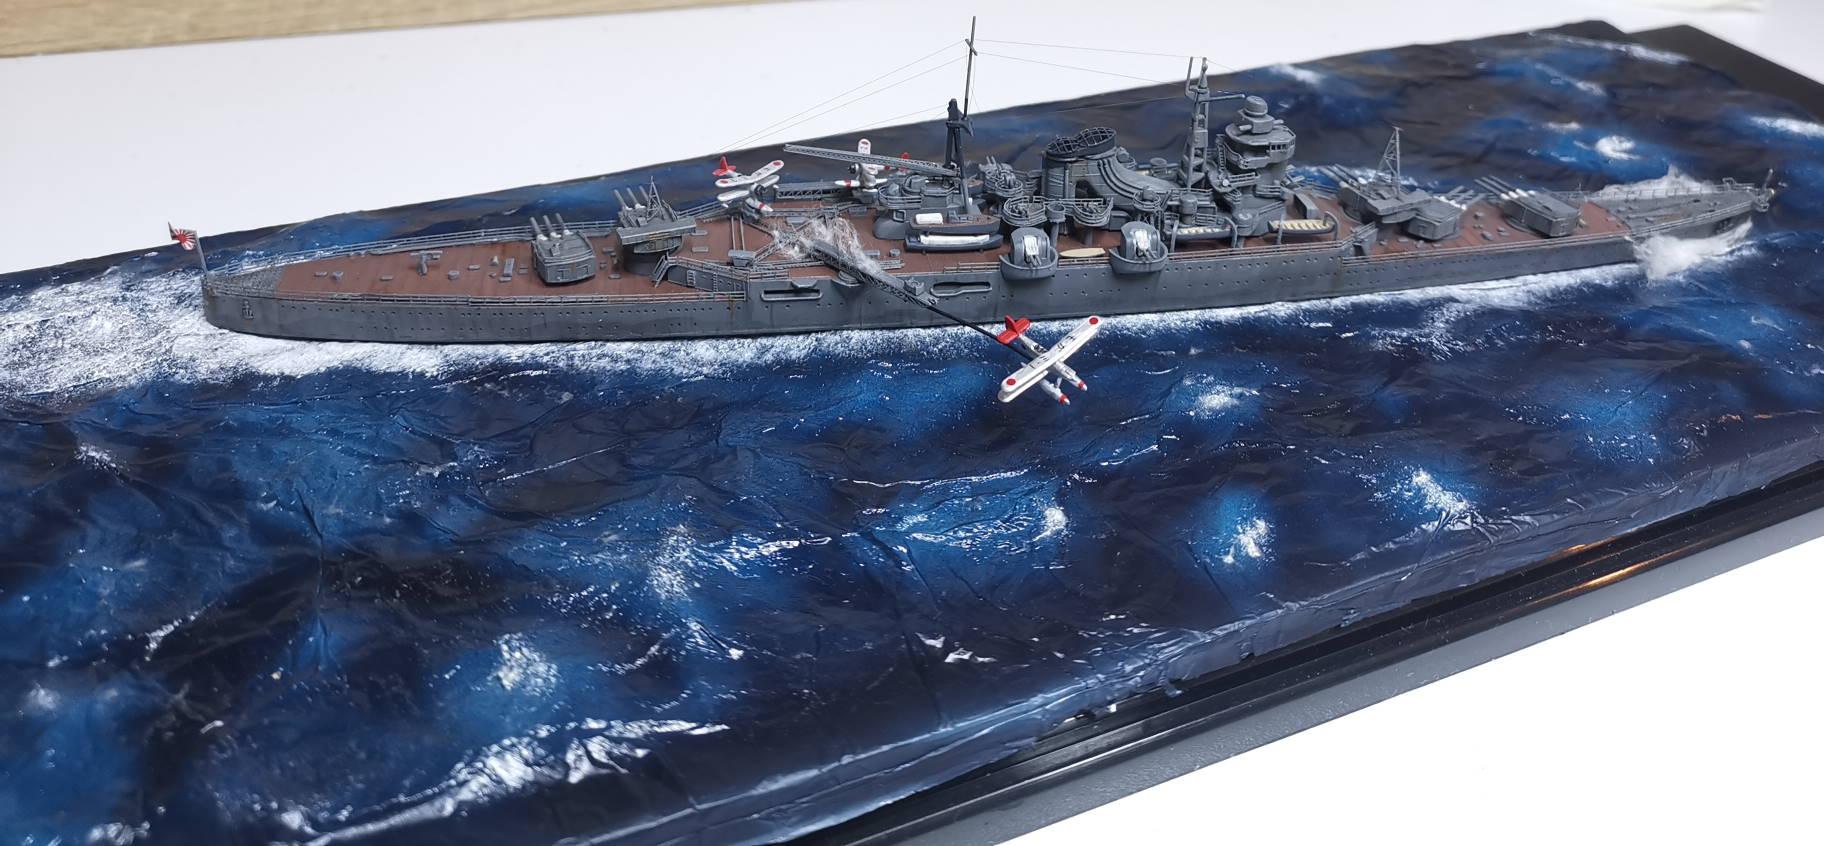 Croiseur léger Mogami Tamiya 1/700e + PE Artist Hobby - Page 3 Mogami18